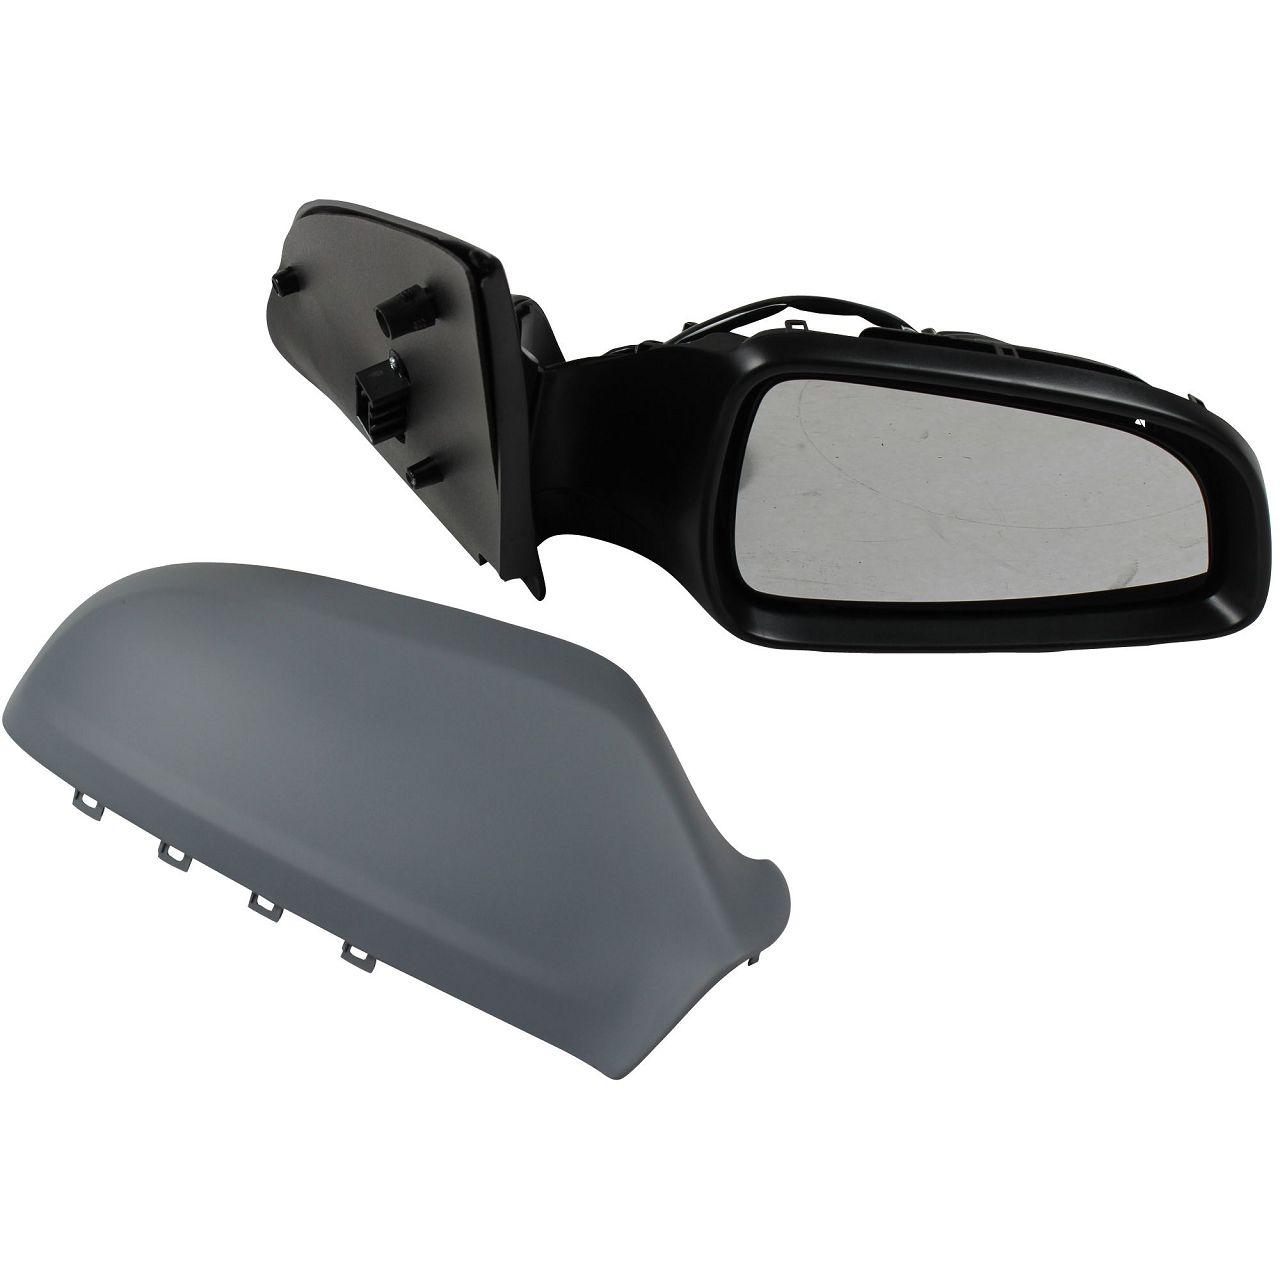 Außenspiegel KOMPLETT elektrisch beheizbar OPEL Astra H 5-türig RECHTS